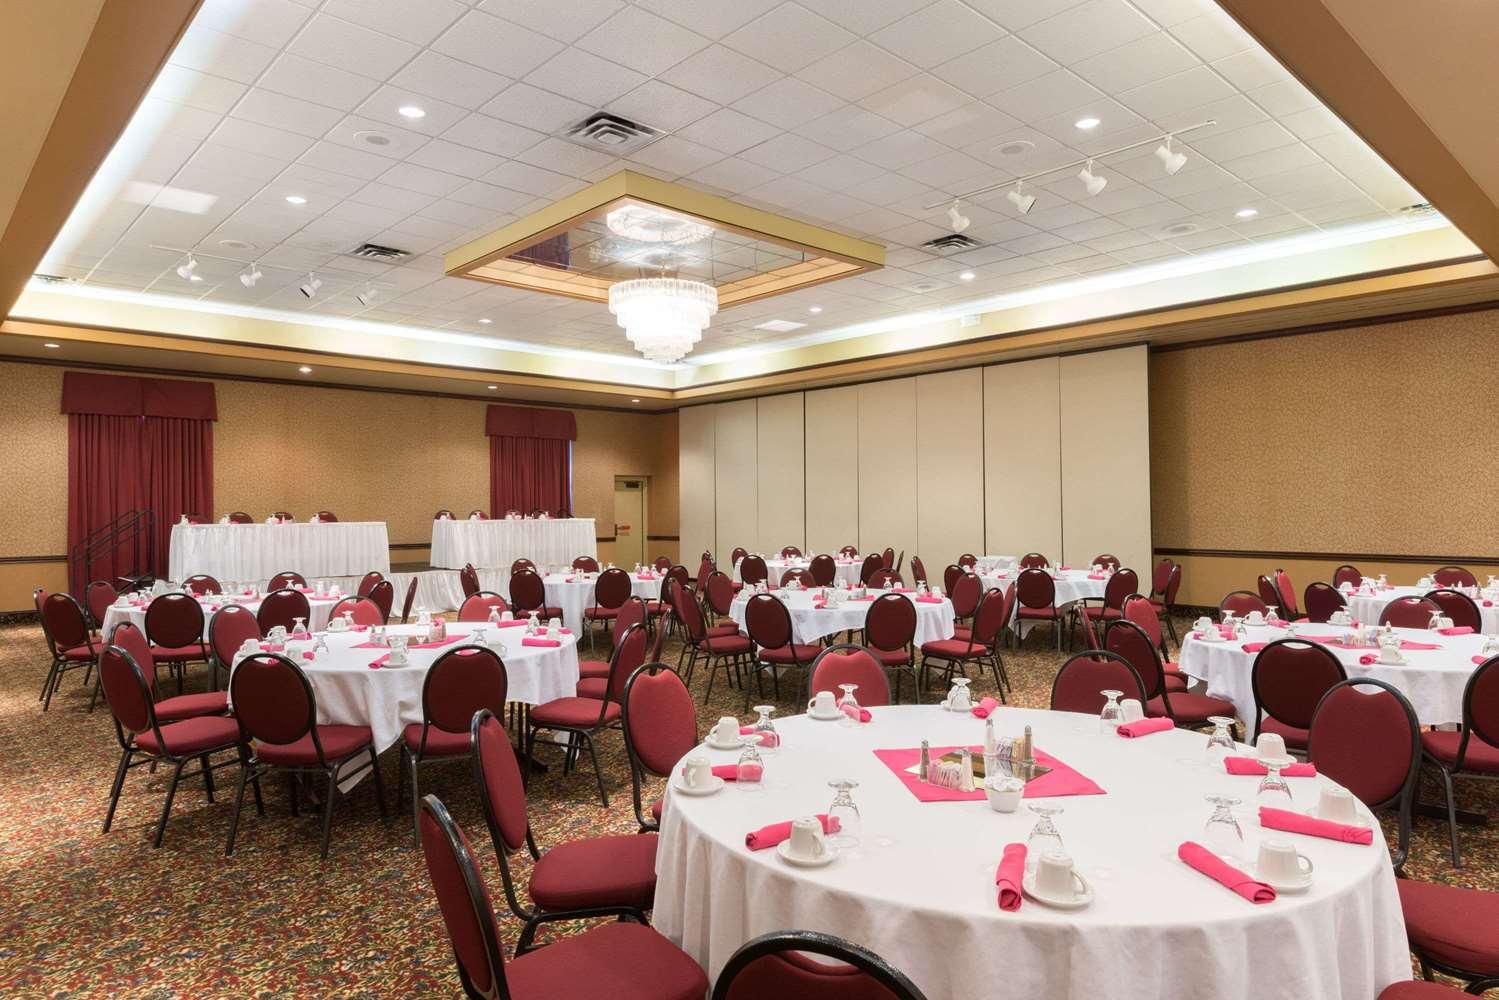 Ballroom - Ramada Inn Convention Center Downtown Topeka